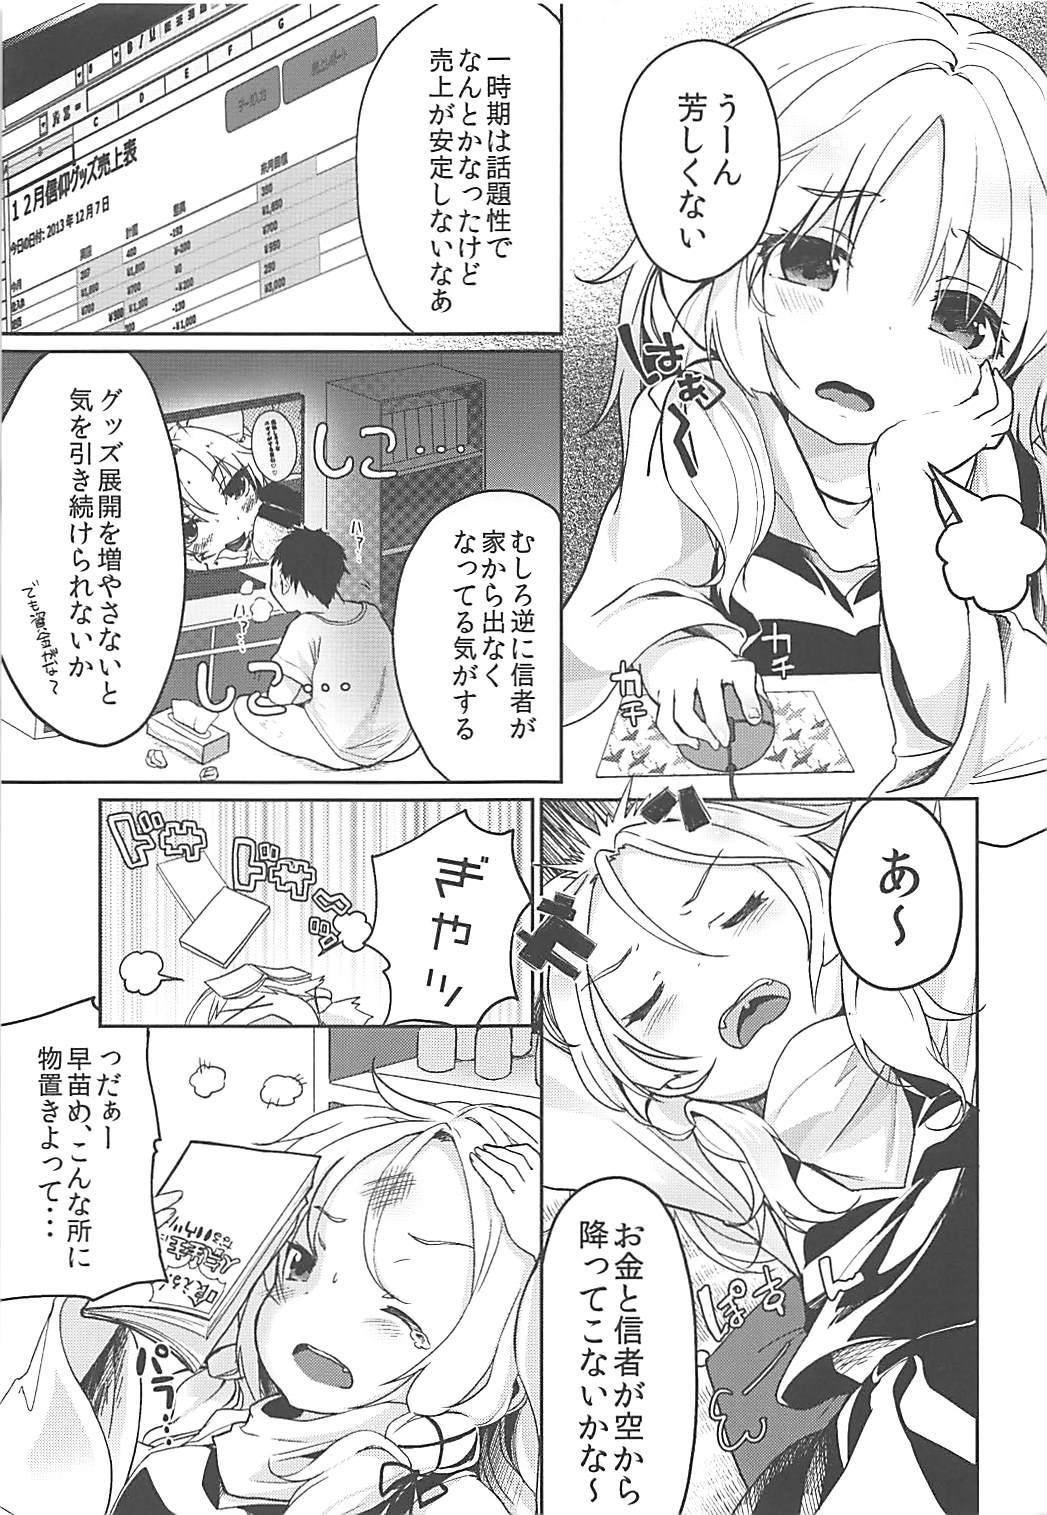 Shinkou Material Sai 3